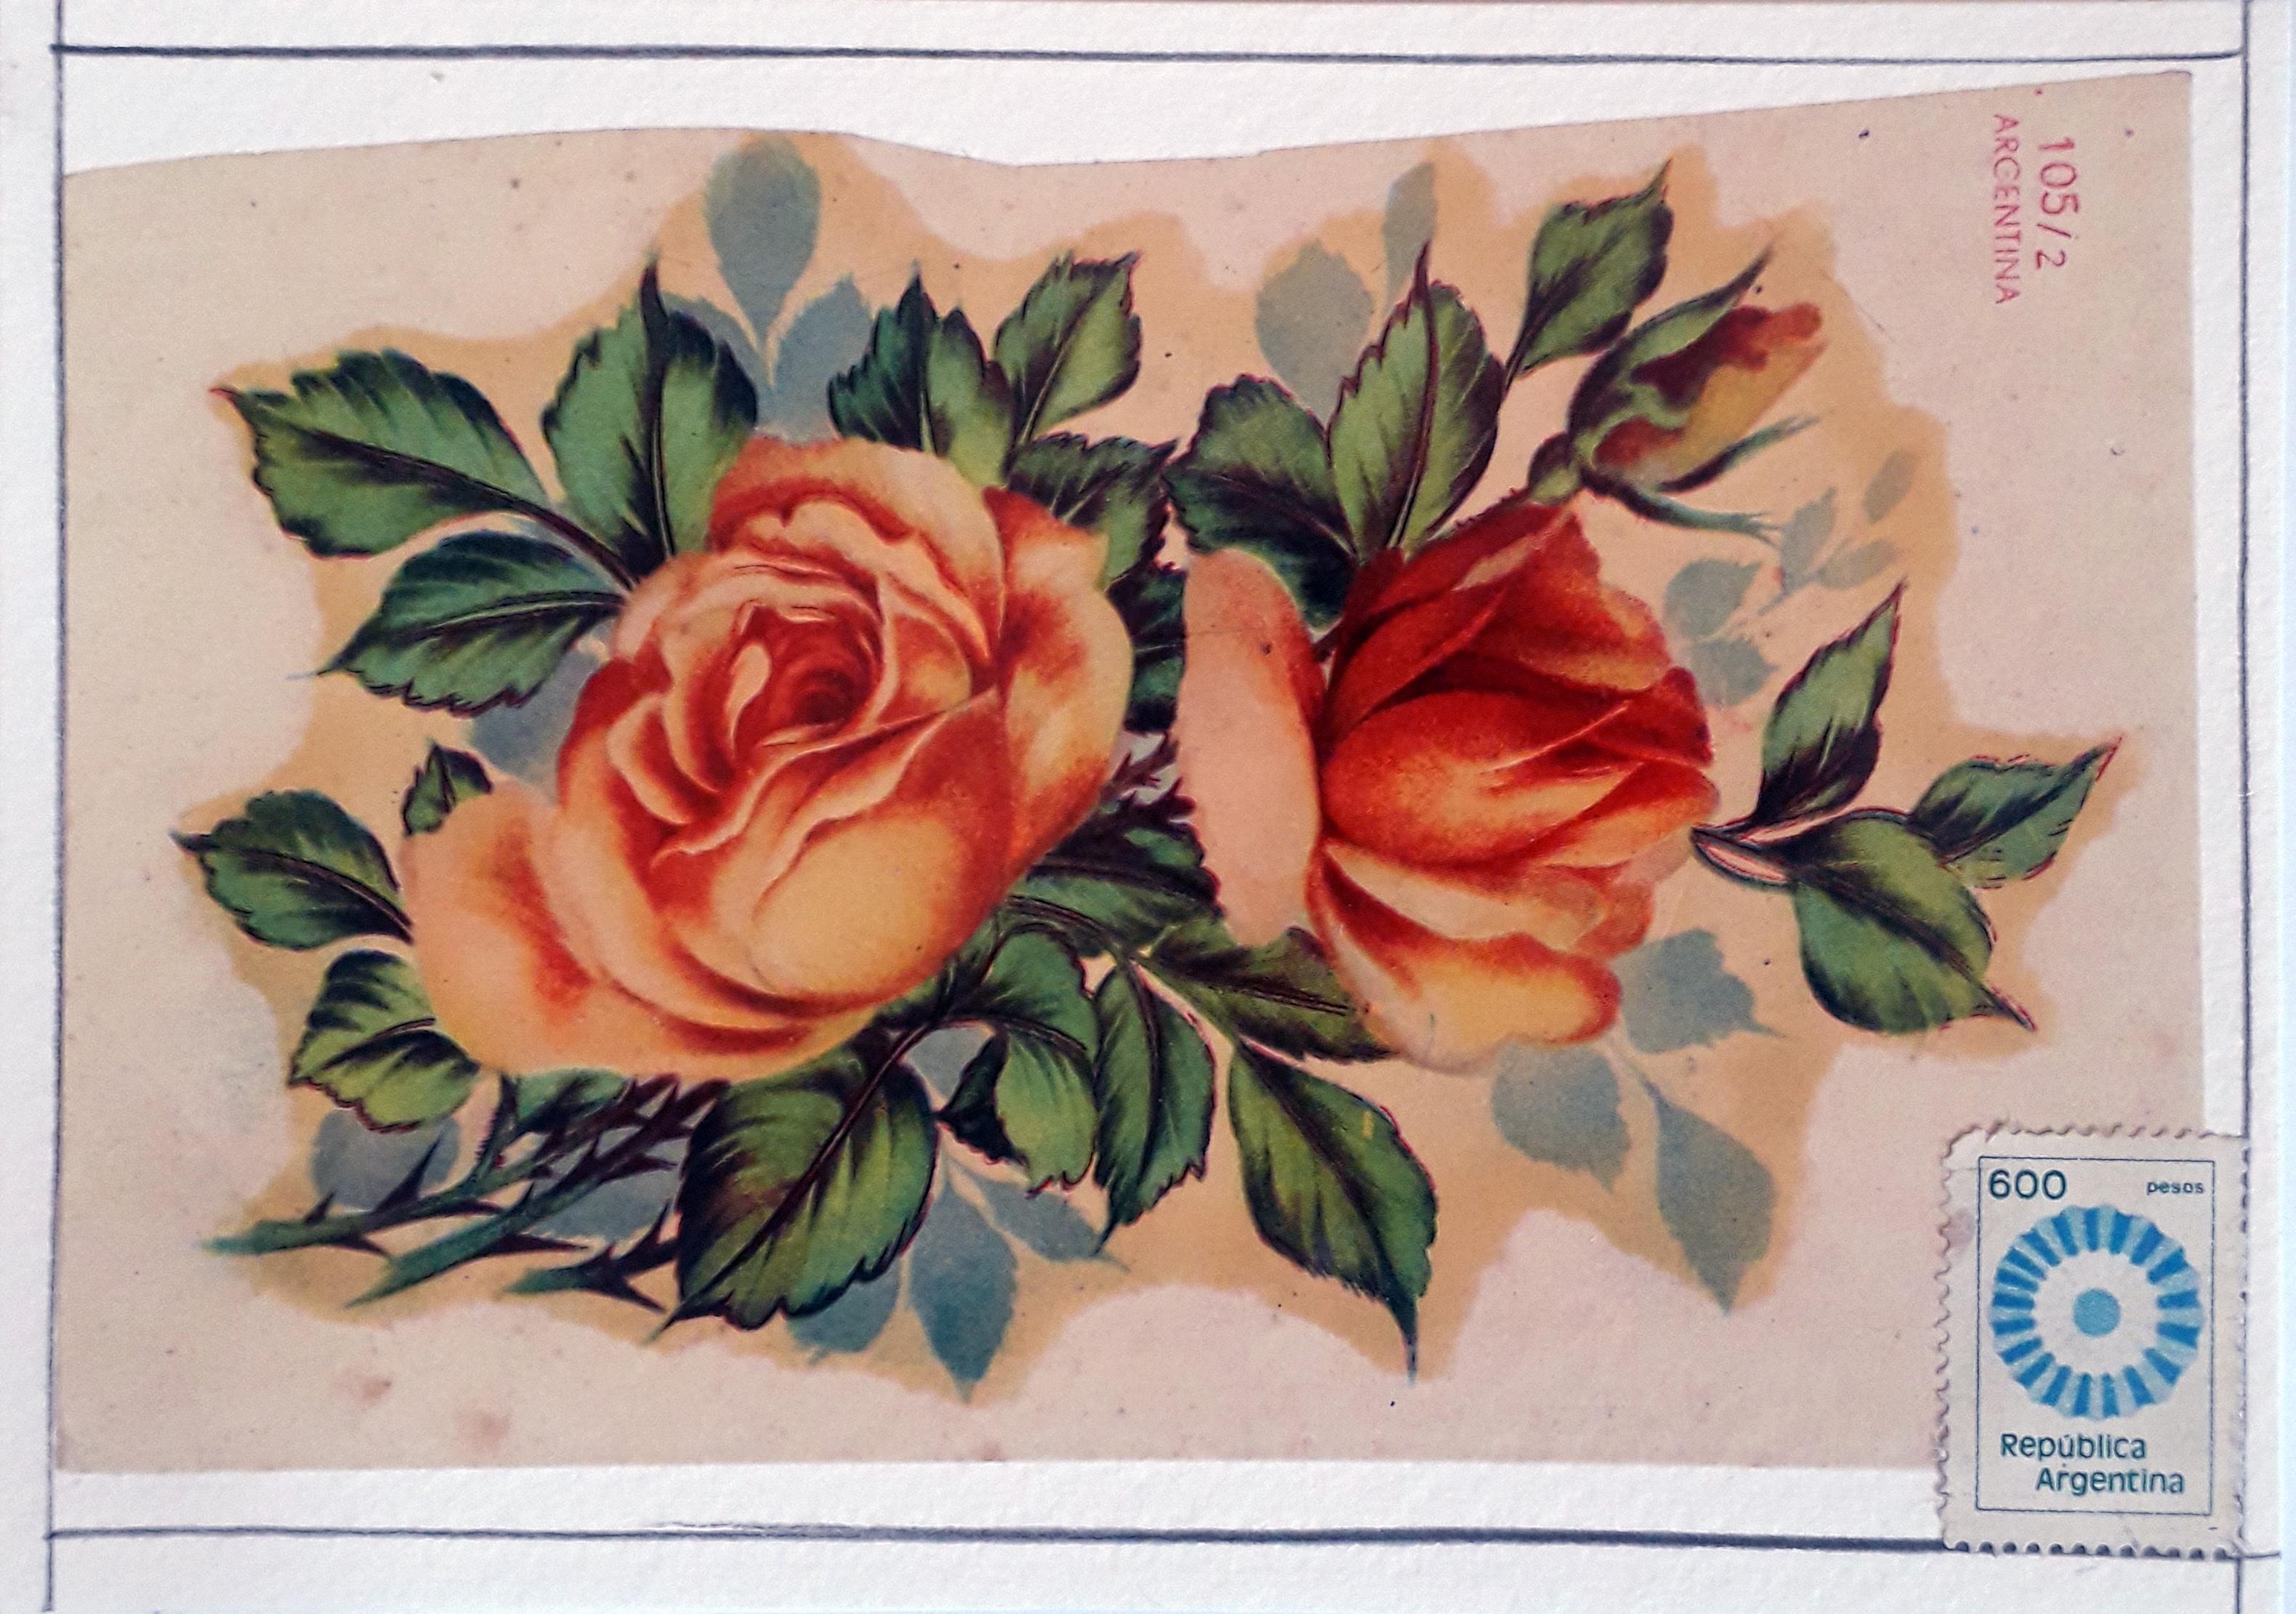 Serie pequeño formato, papel collage sobre tarjeta postal, 10 cm x 15 cm, 2020